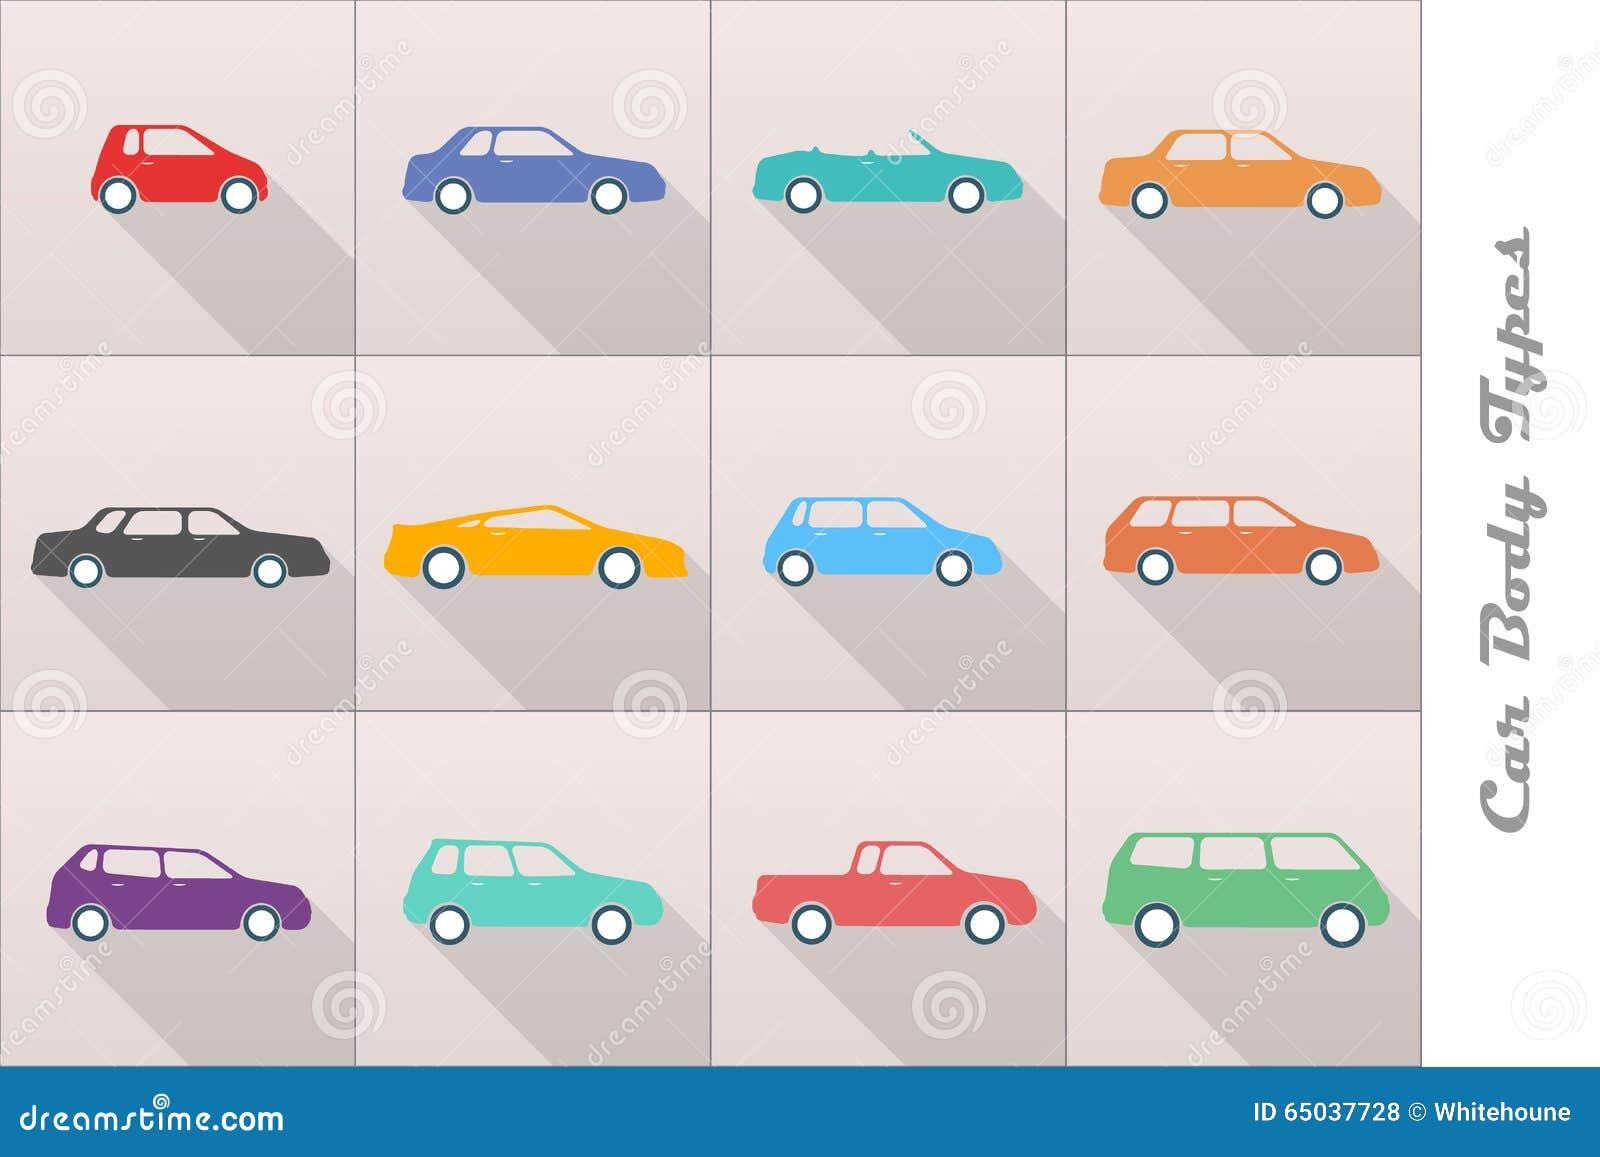 Car Body Types Stock Vector - Image: 65037728